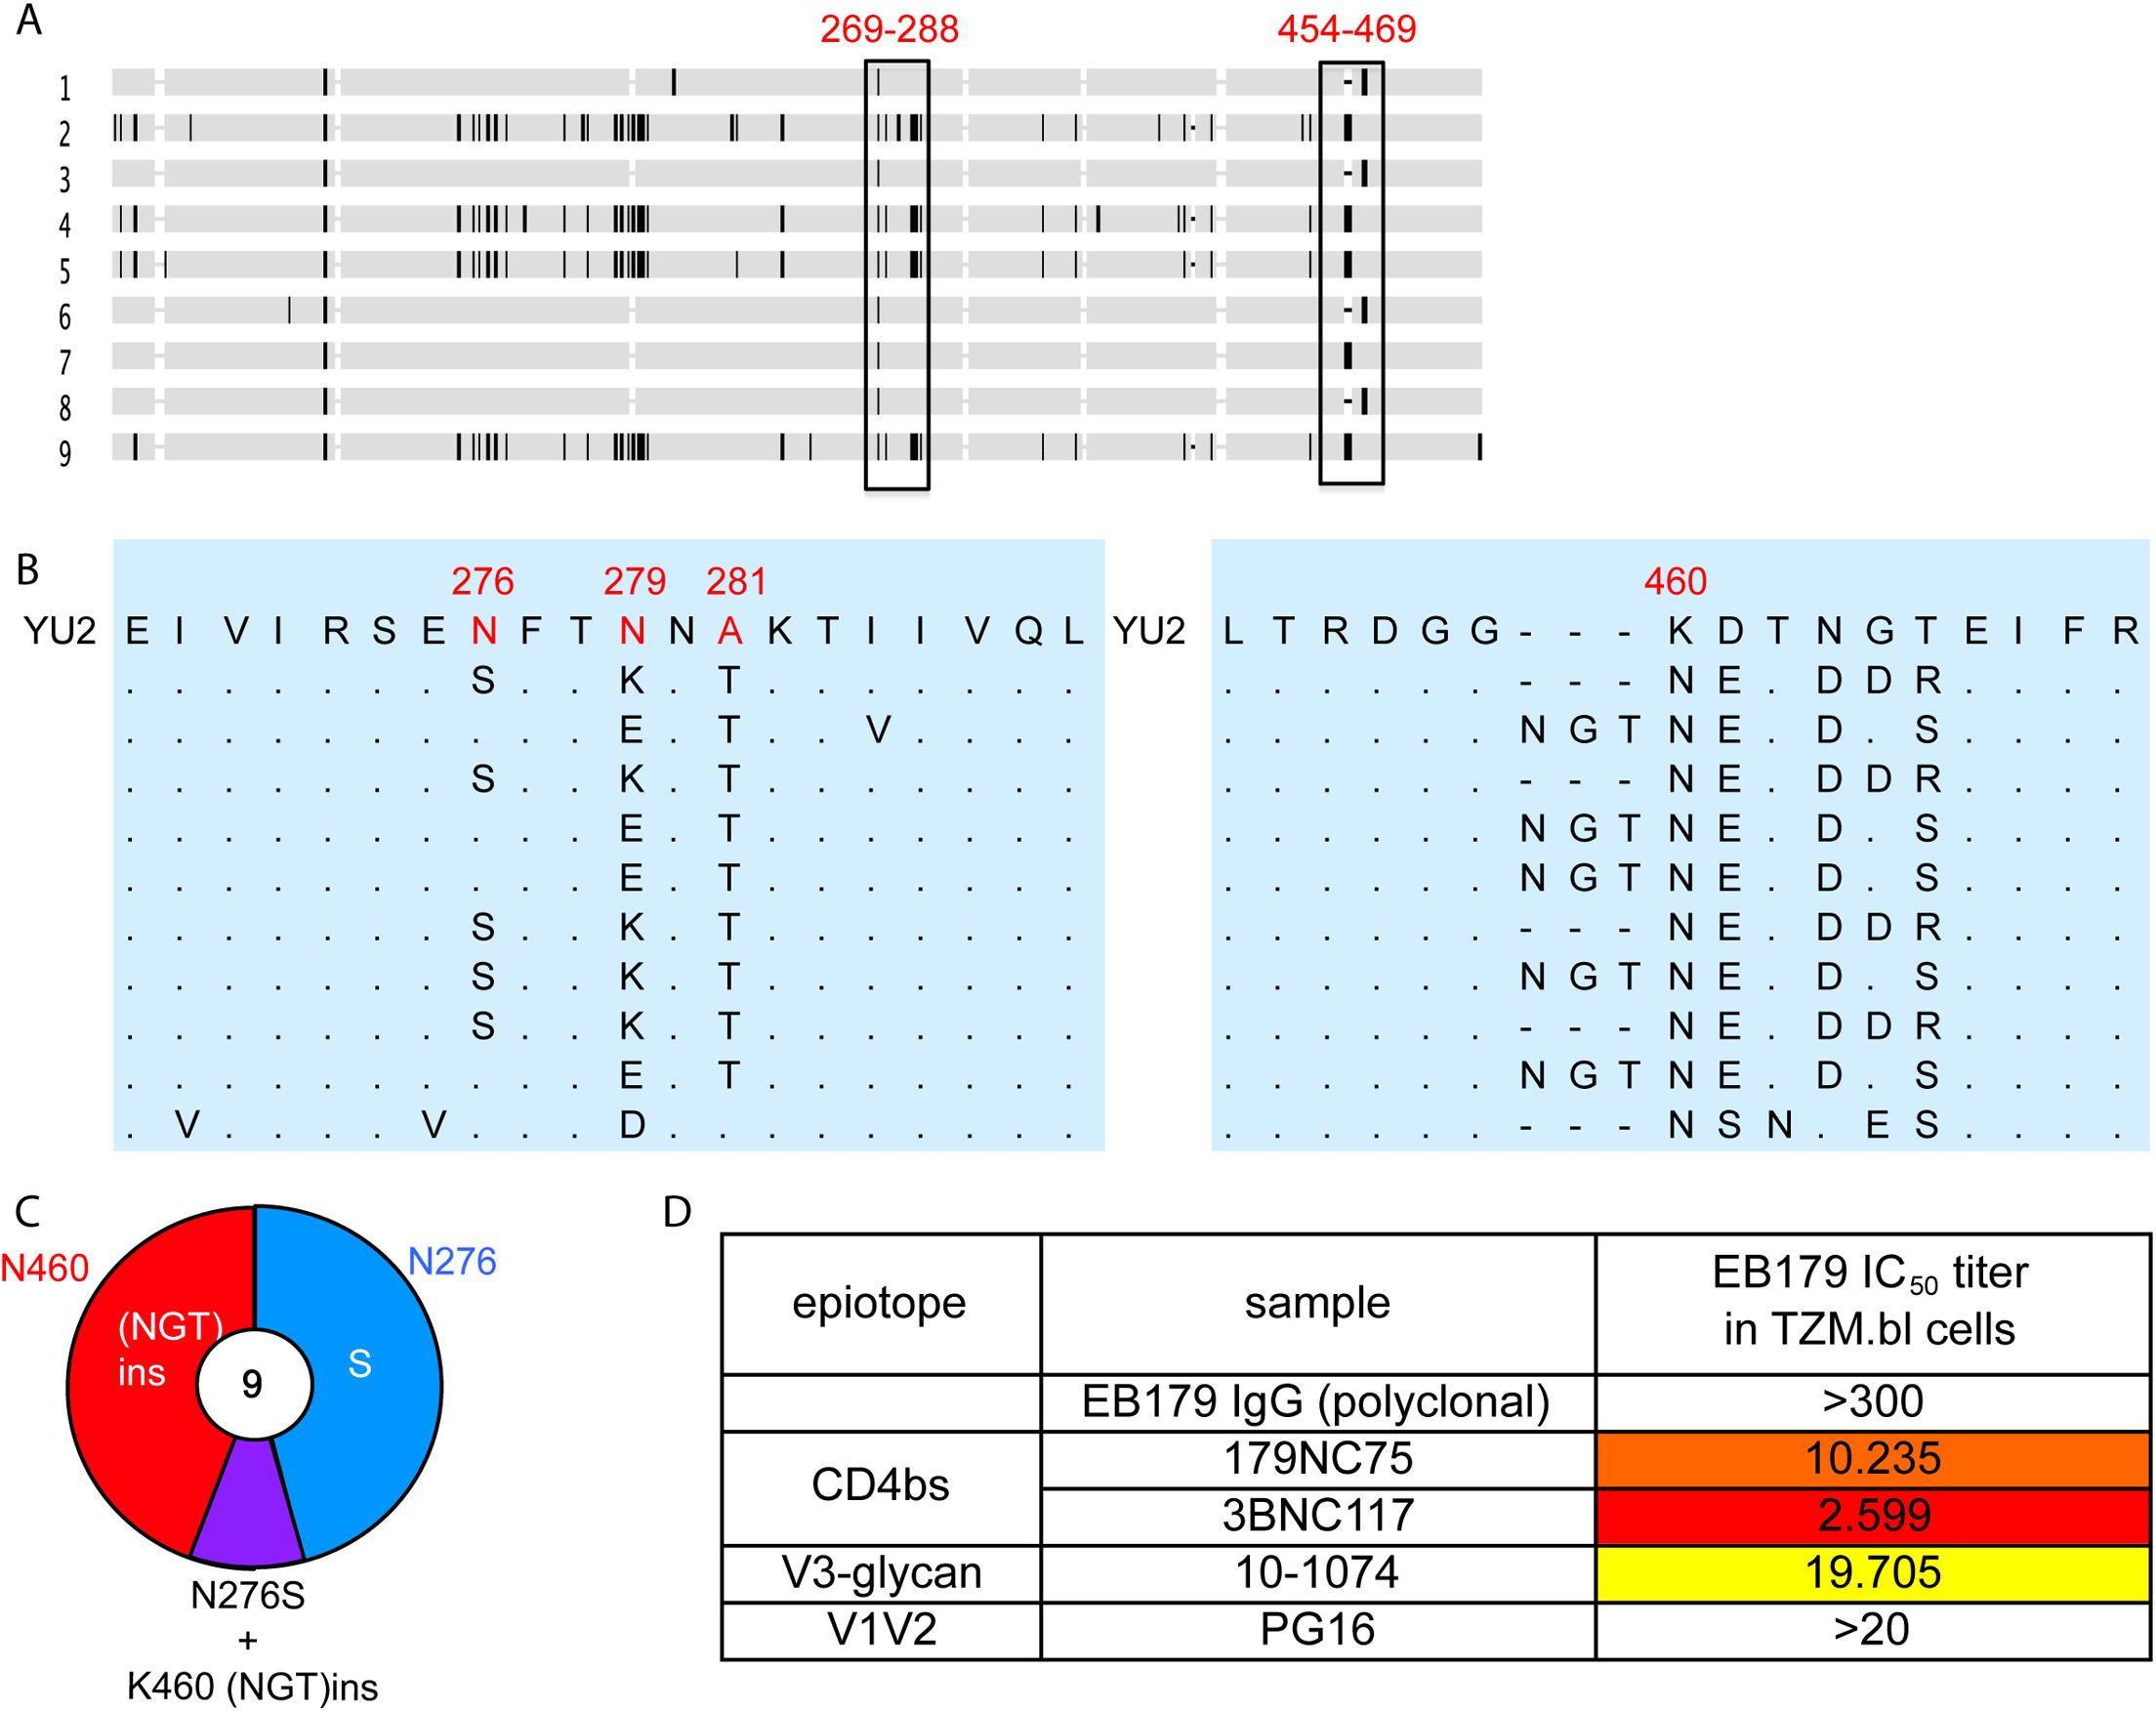 Autologous viruses from EB179.